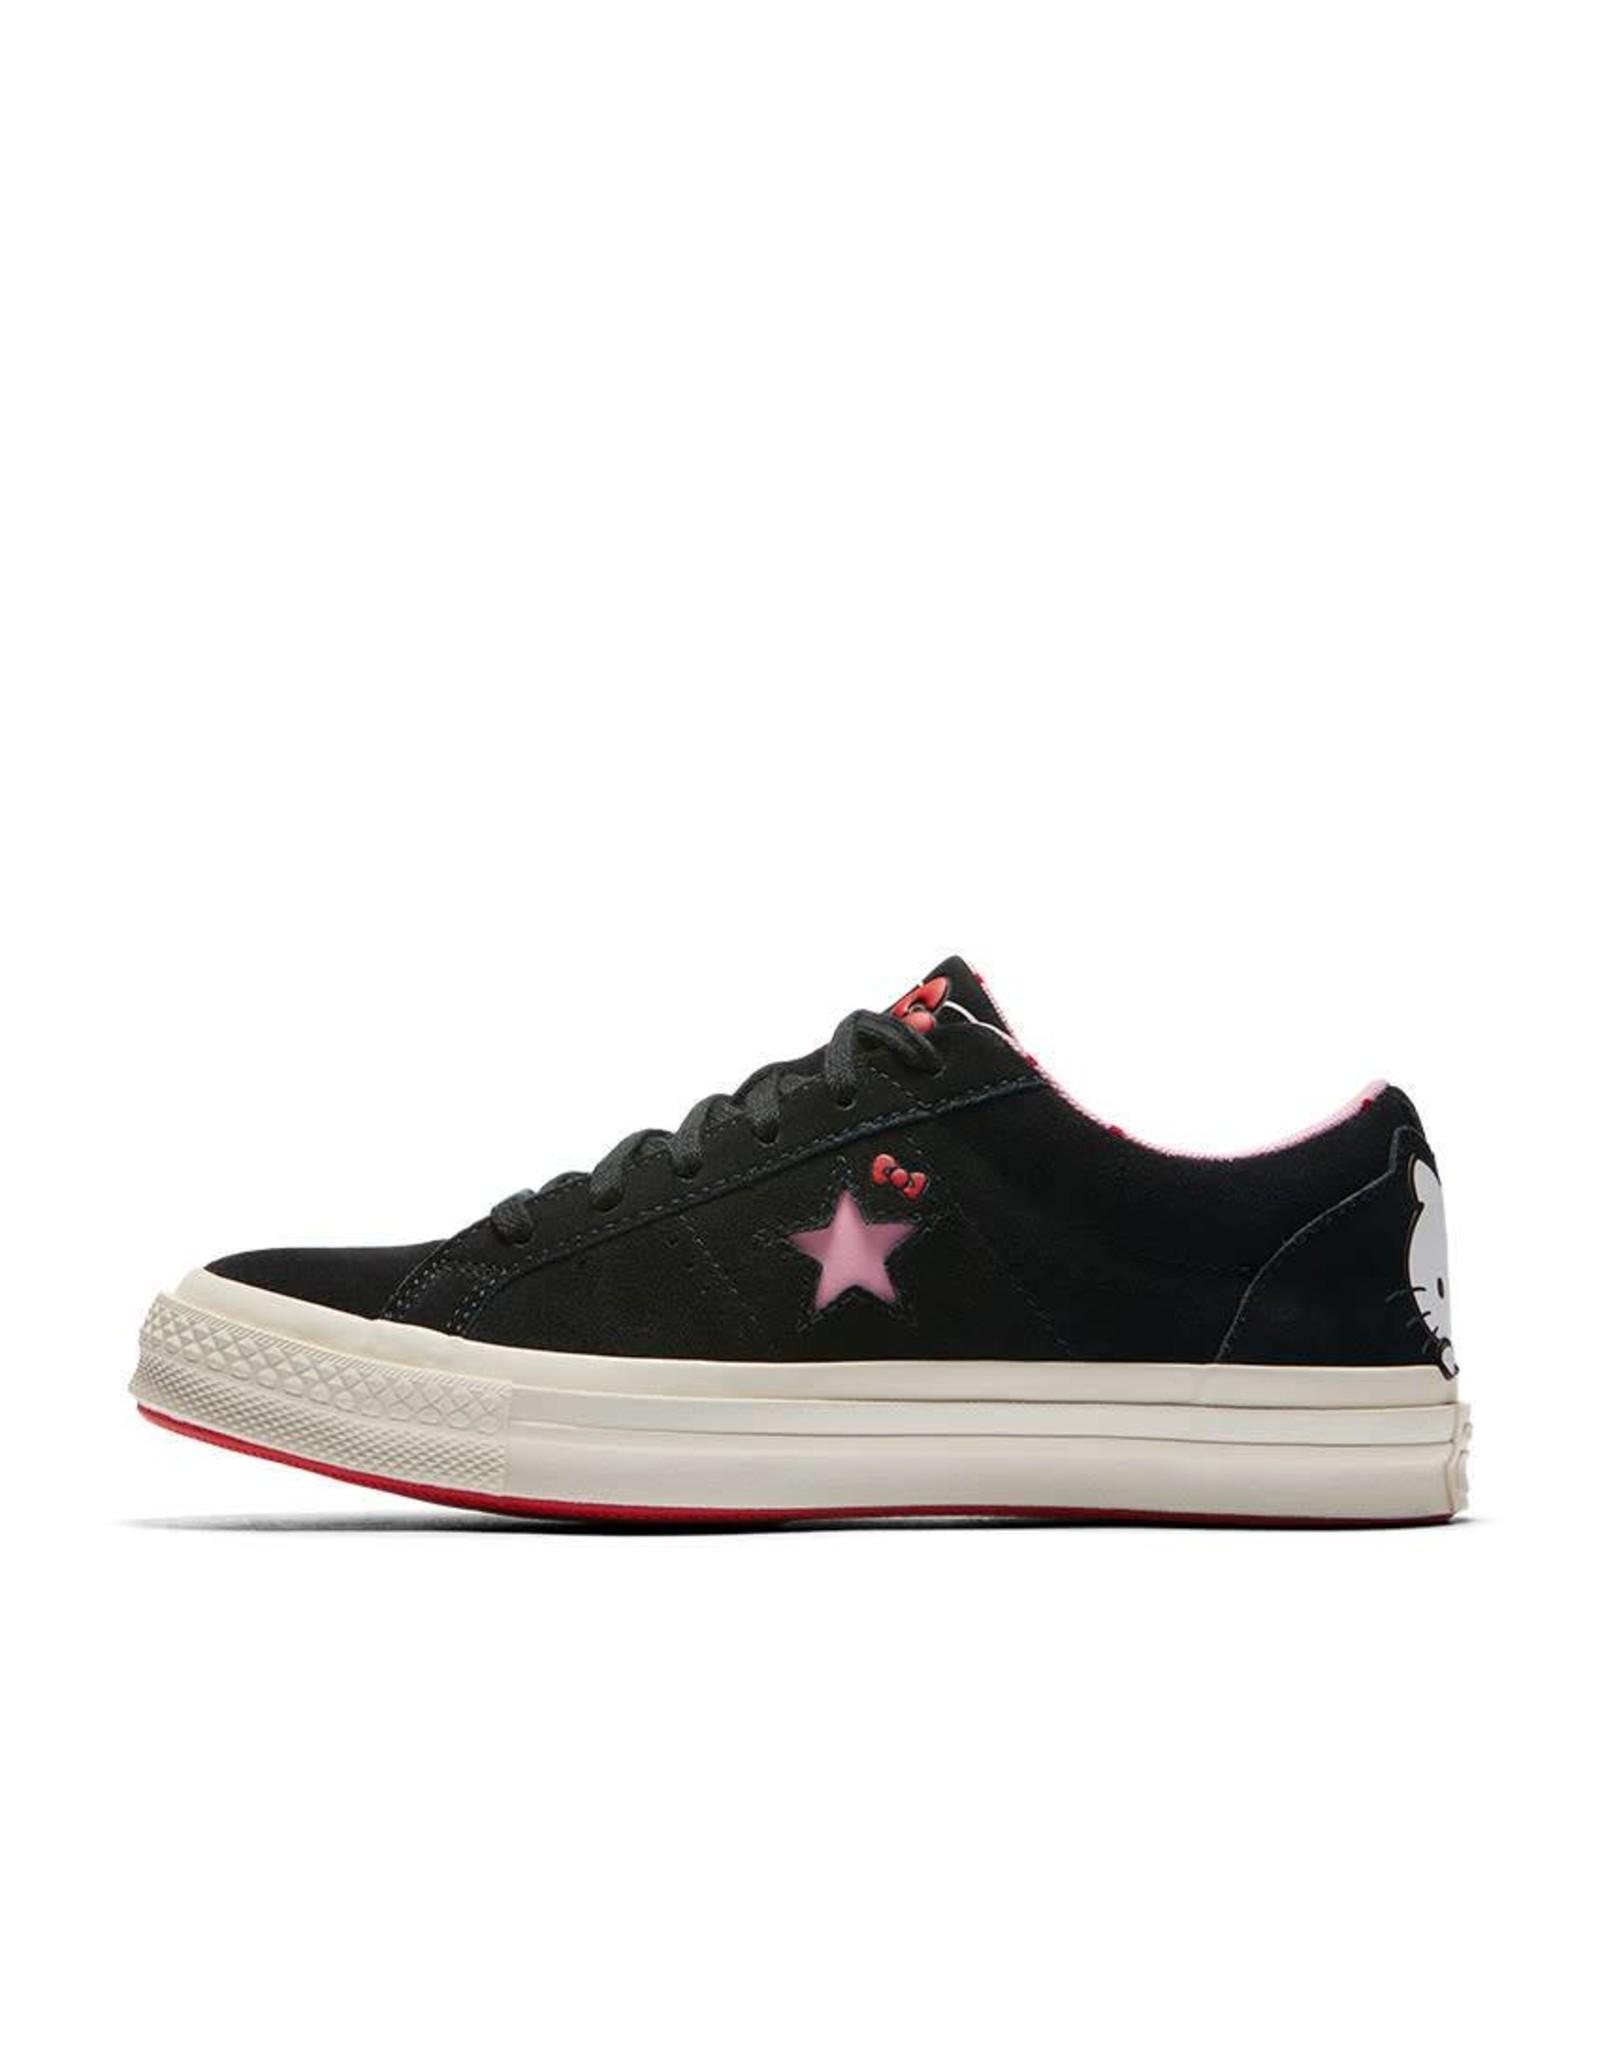 CONVERSE ONE STAR OX BLACK/PRISM PINK/EGRET HELLO KITTY CY887HKE-362940C